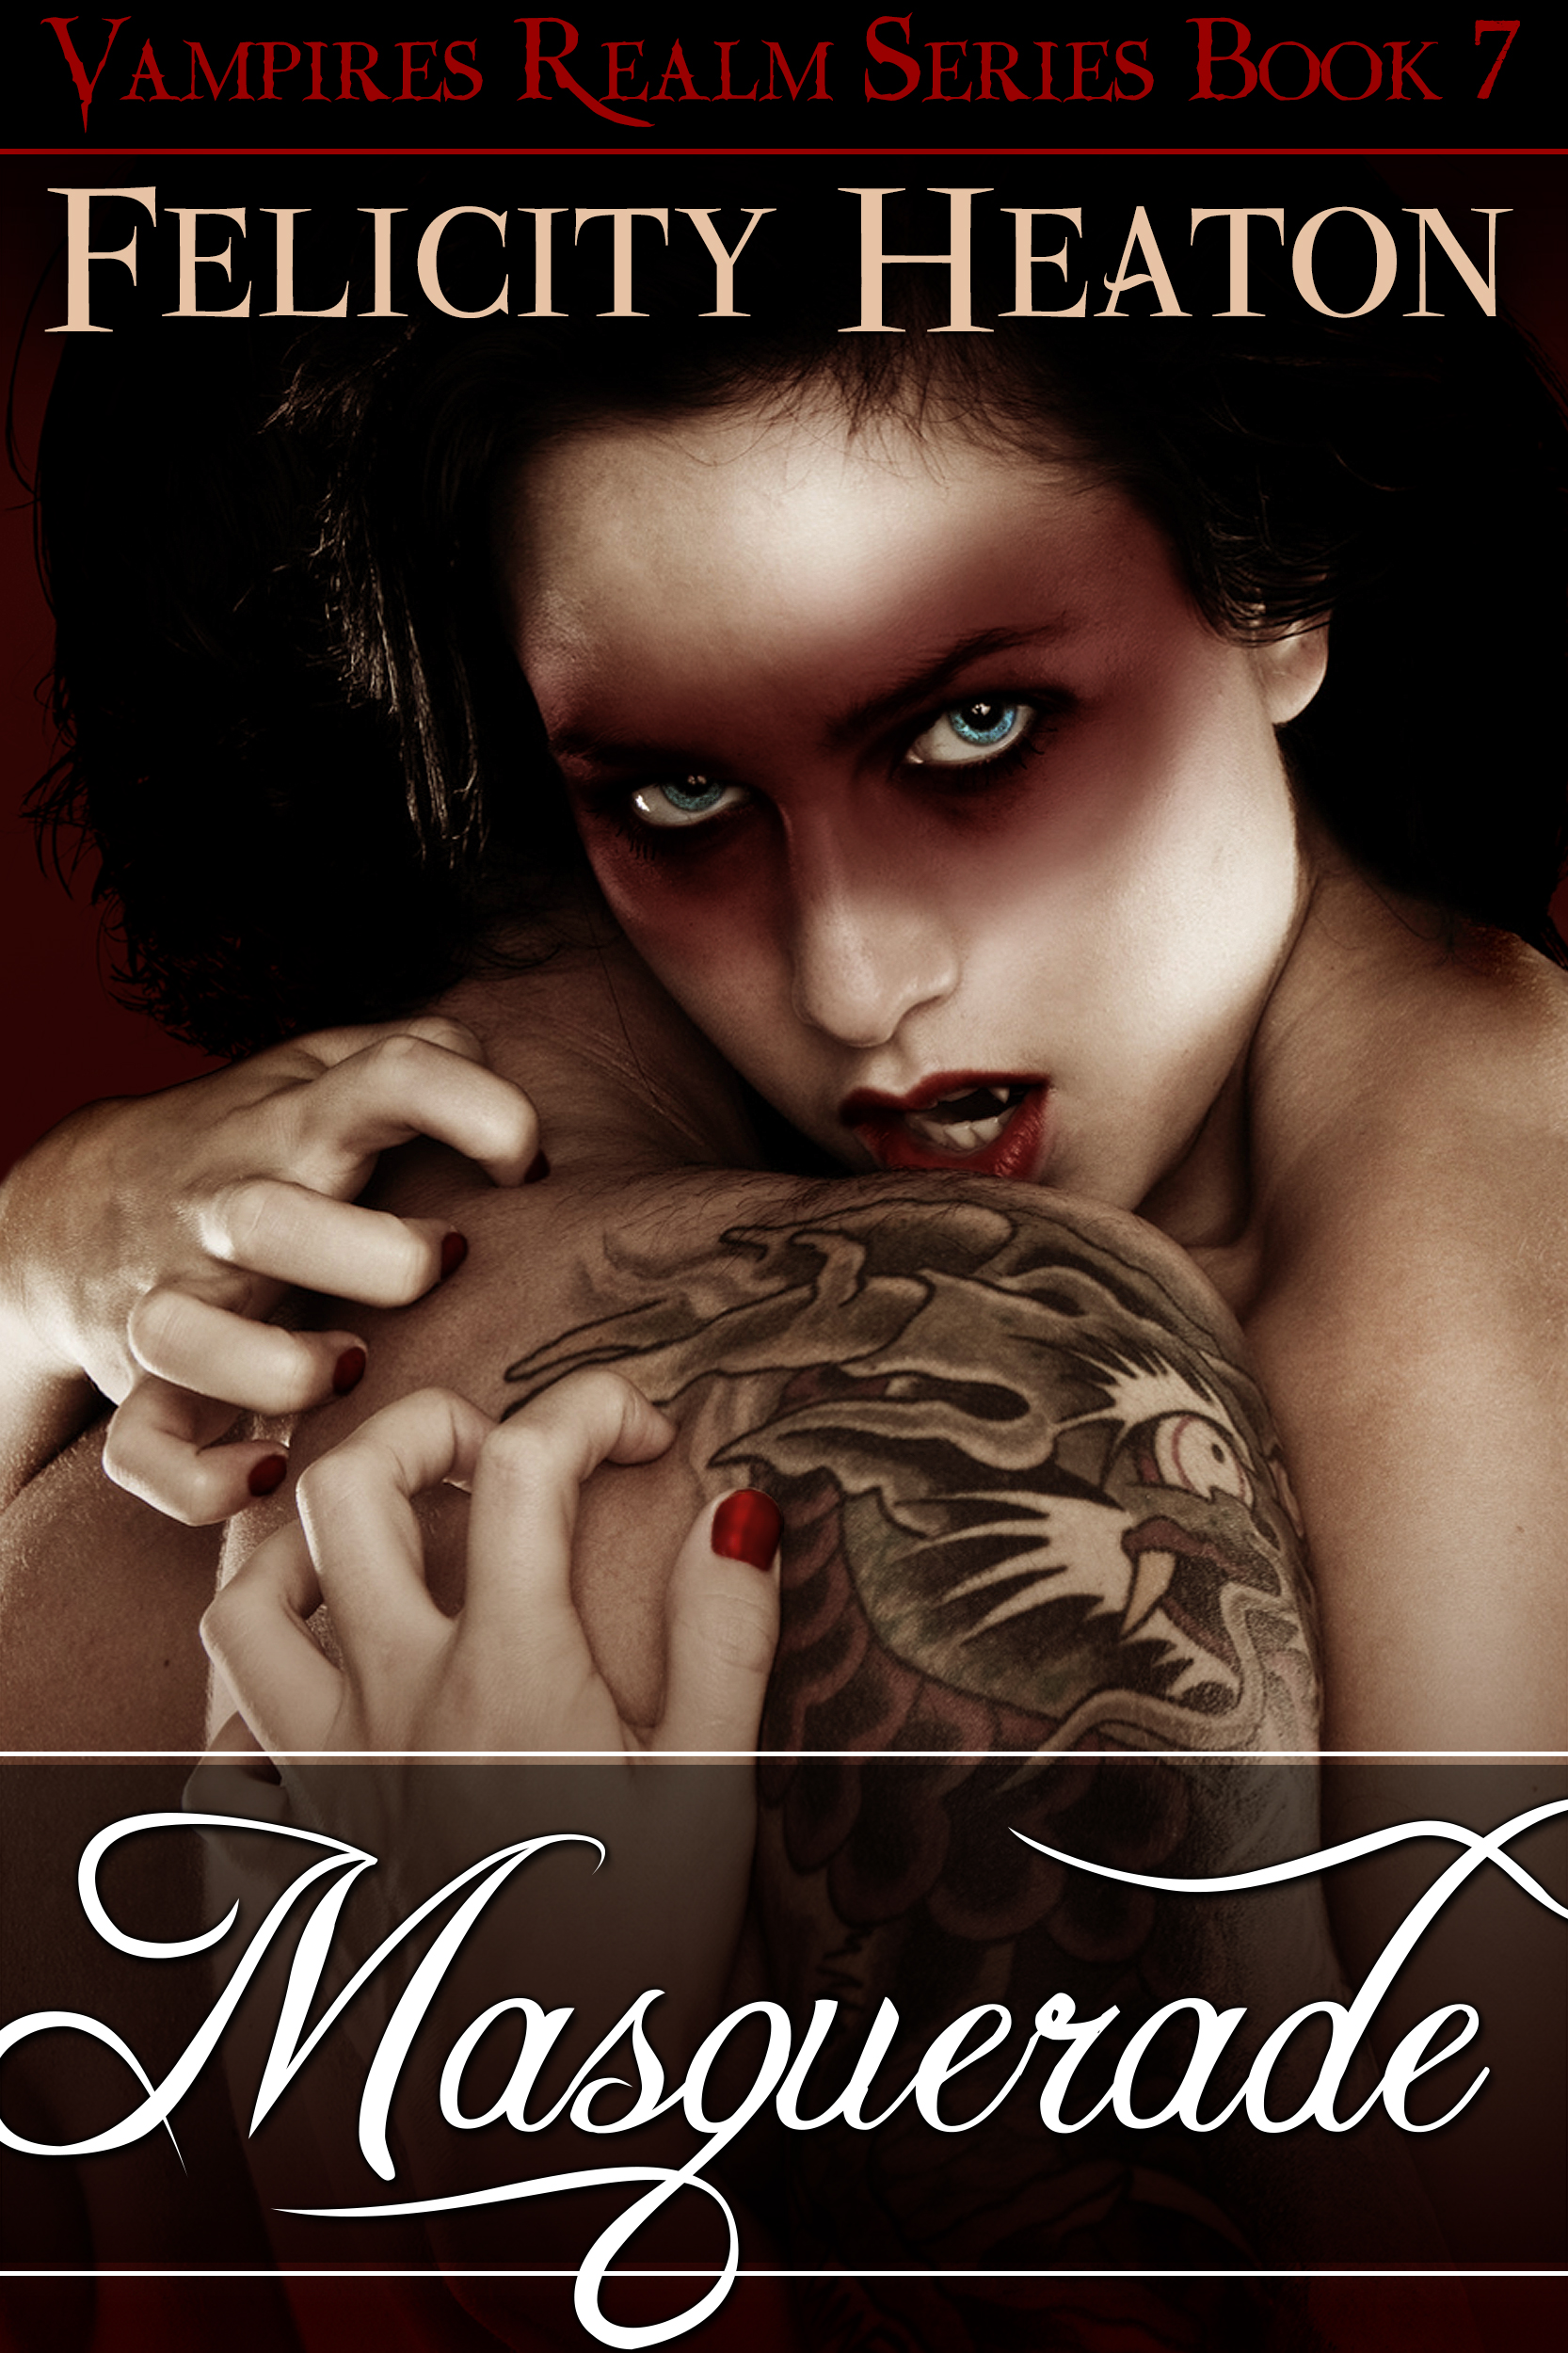 Felicity Heaton - Masquerade (Vampires Realm Romance Series #7)